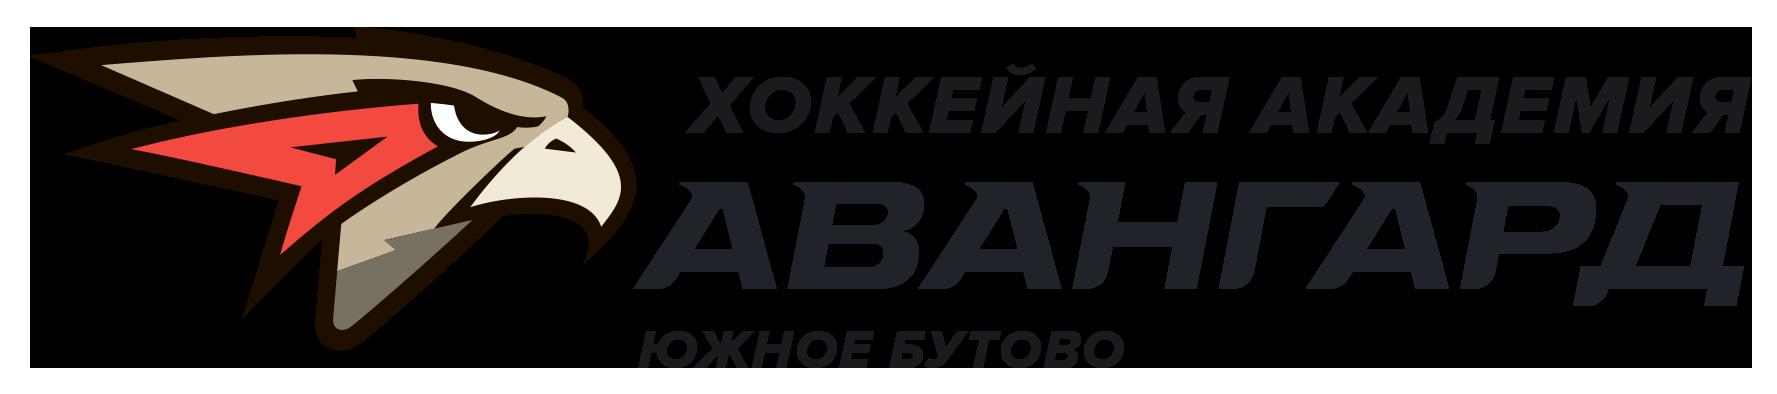 Хоккейная Академия Авангард